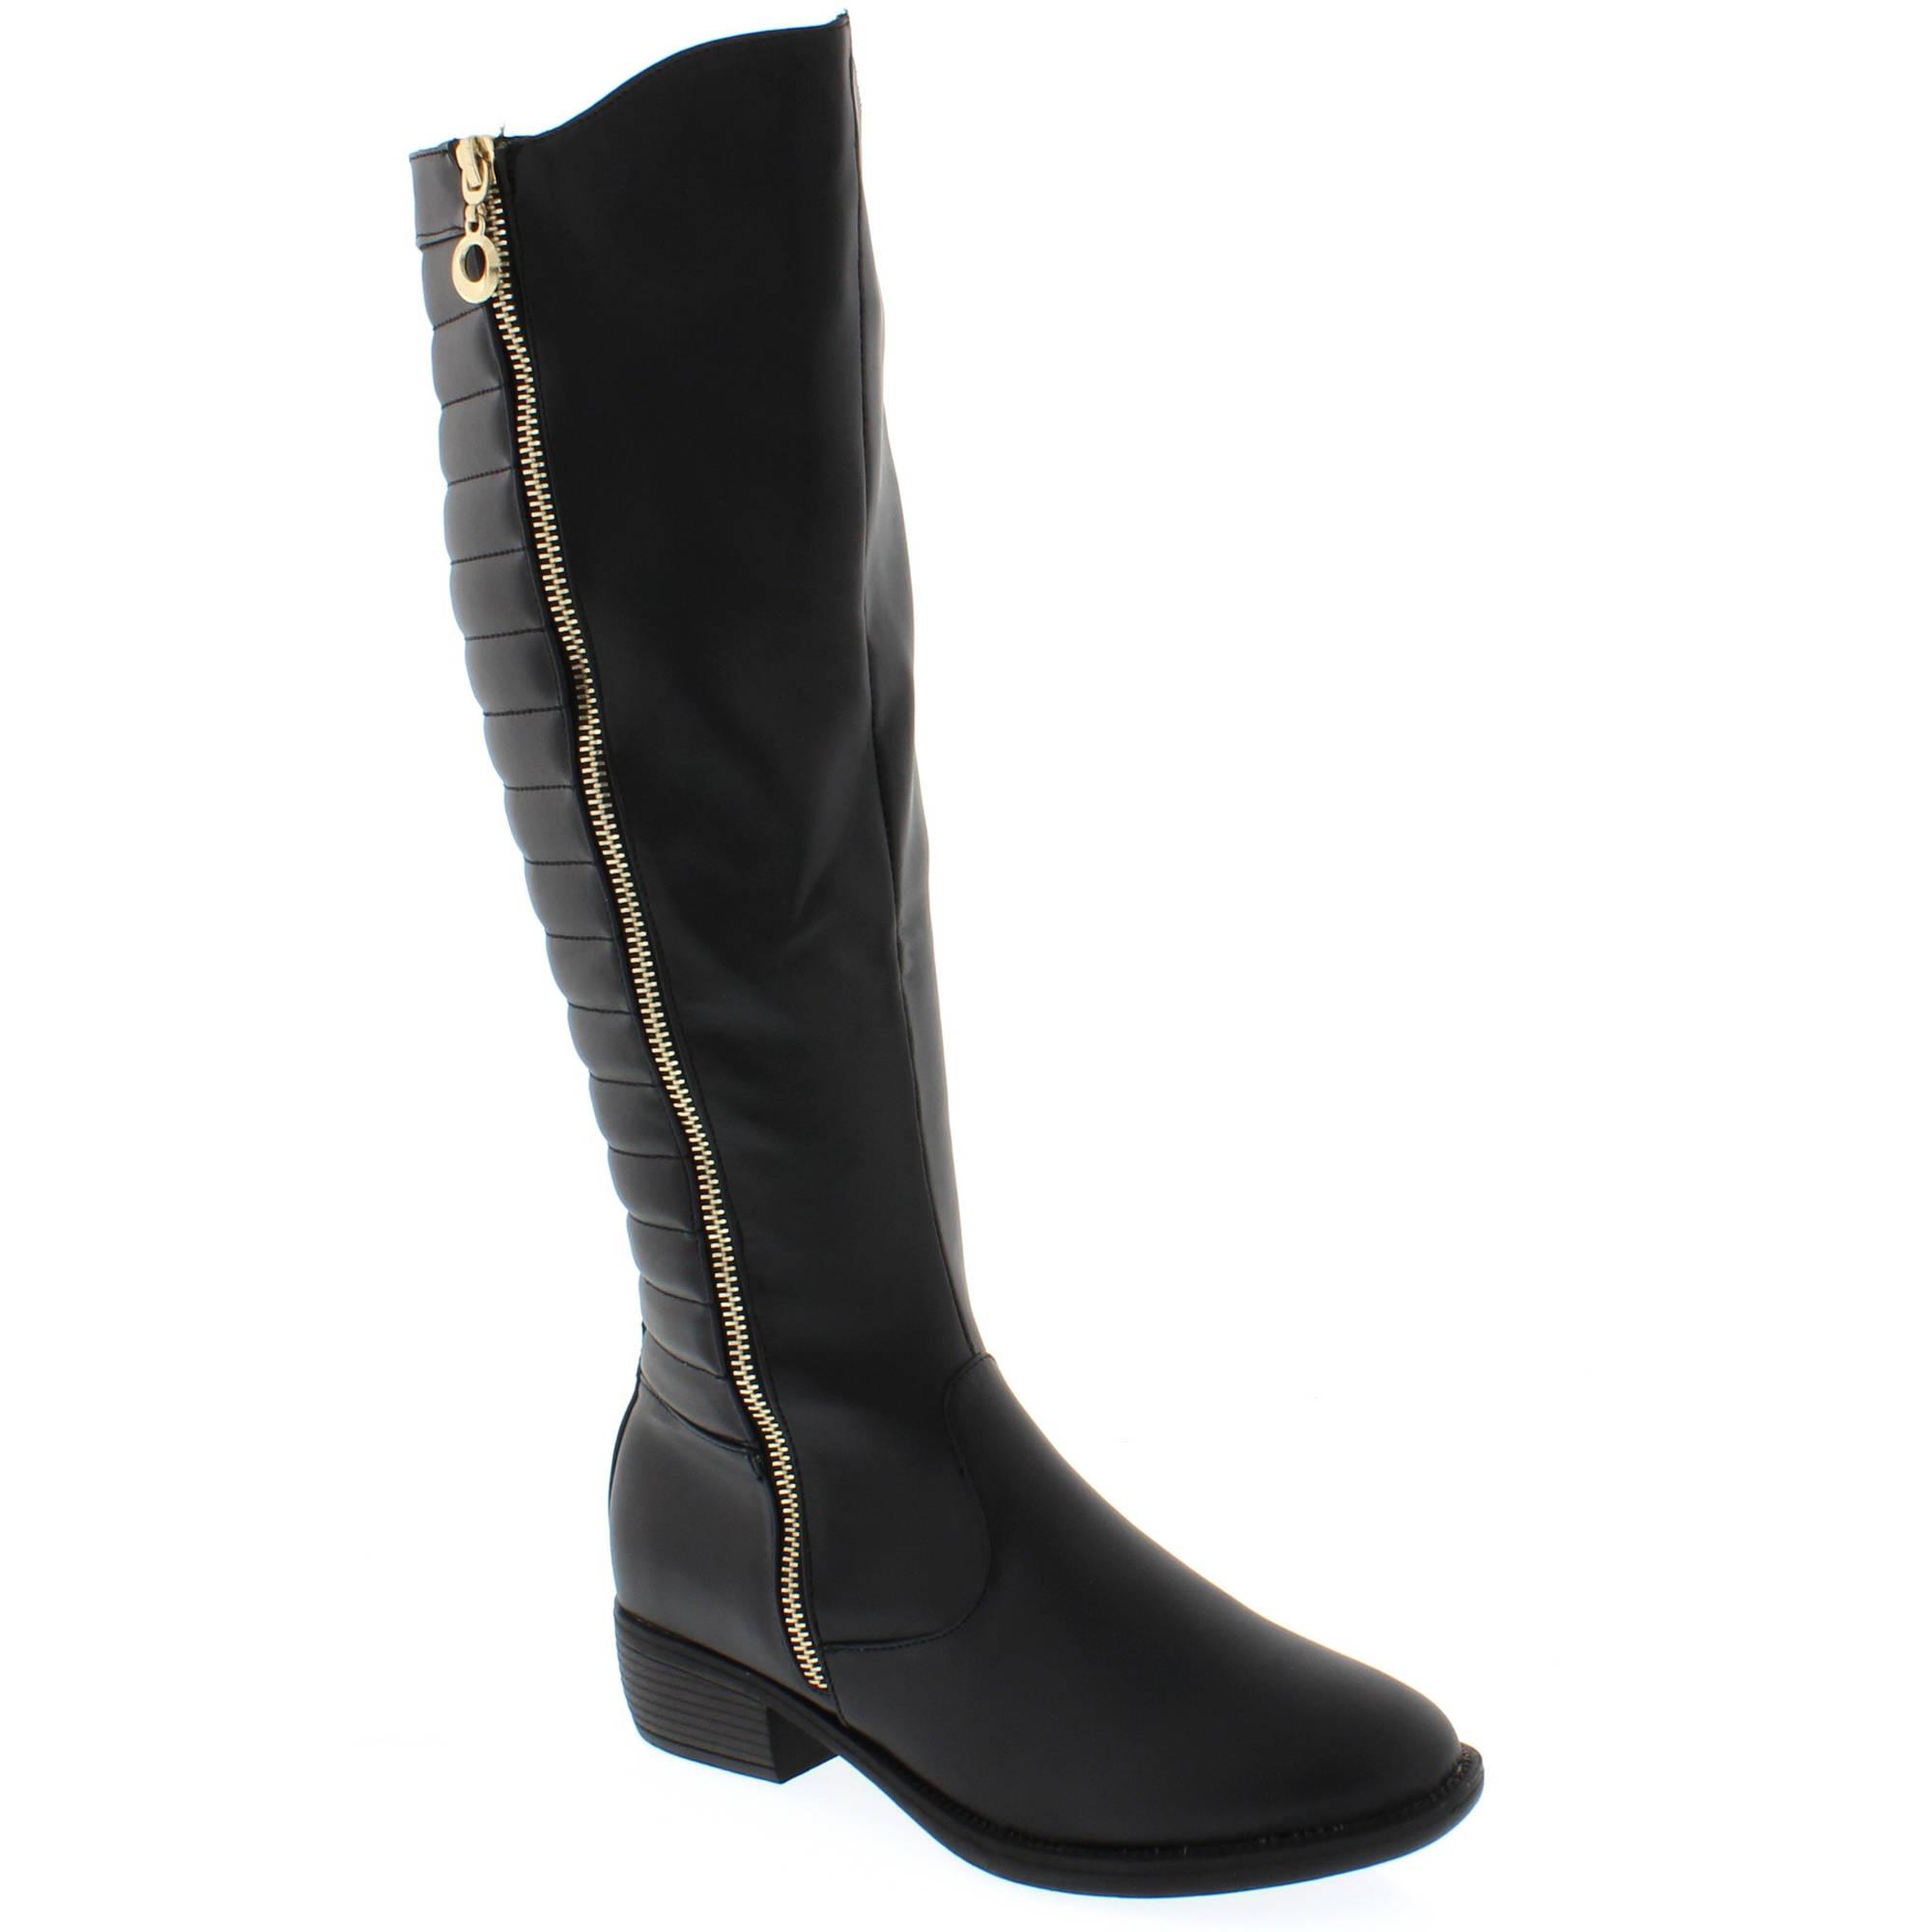 shoes of soul s zipper boots walmart